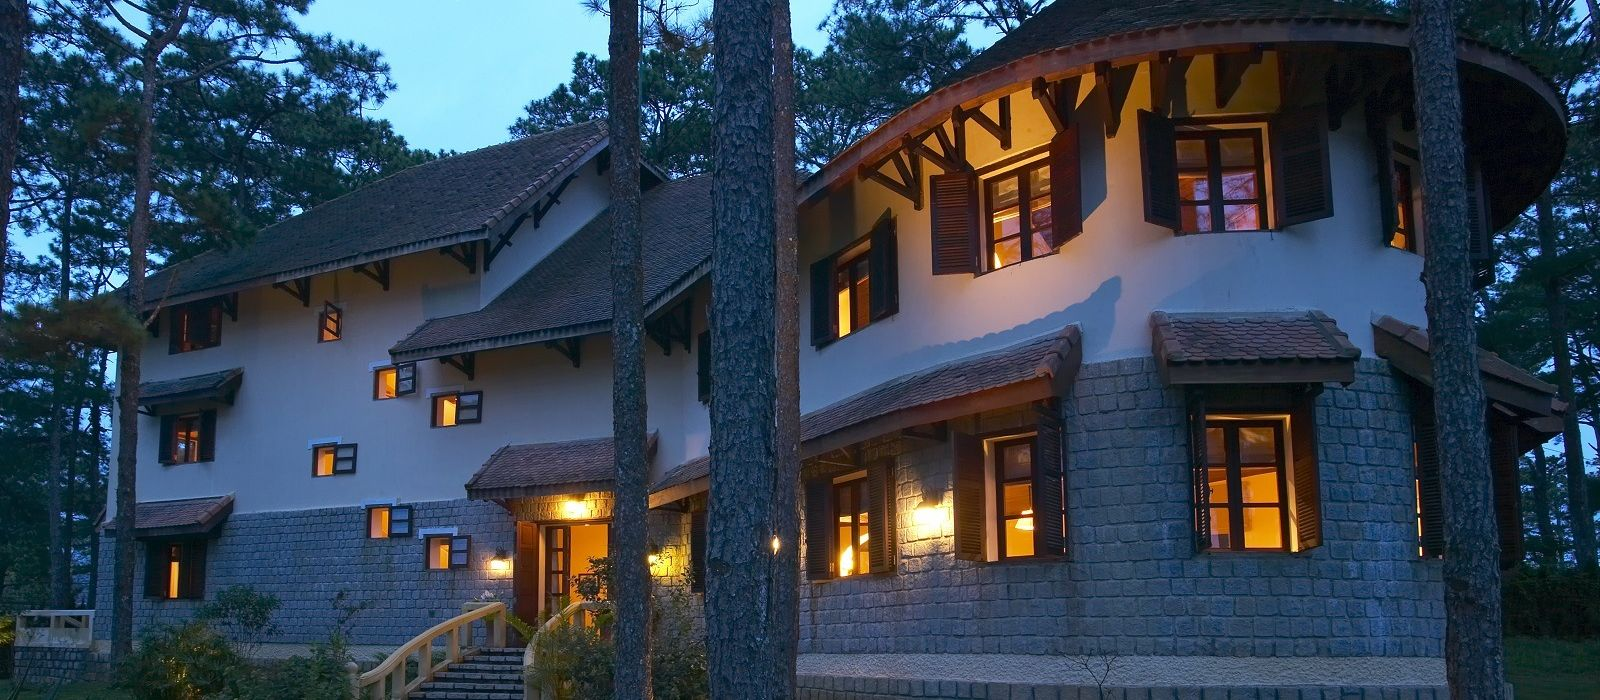 Hotel Ana Mandara Villas & Resort (Dalat) Vietnam